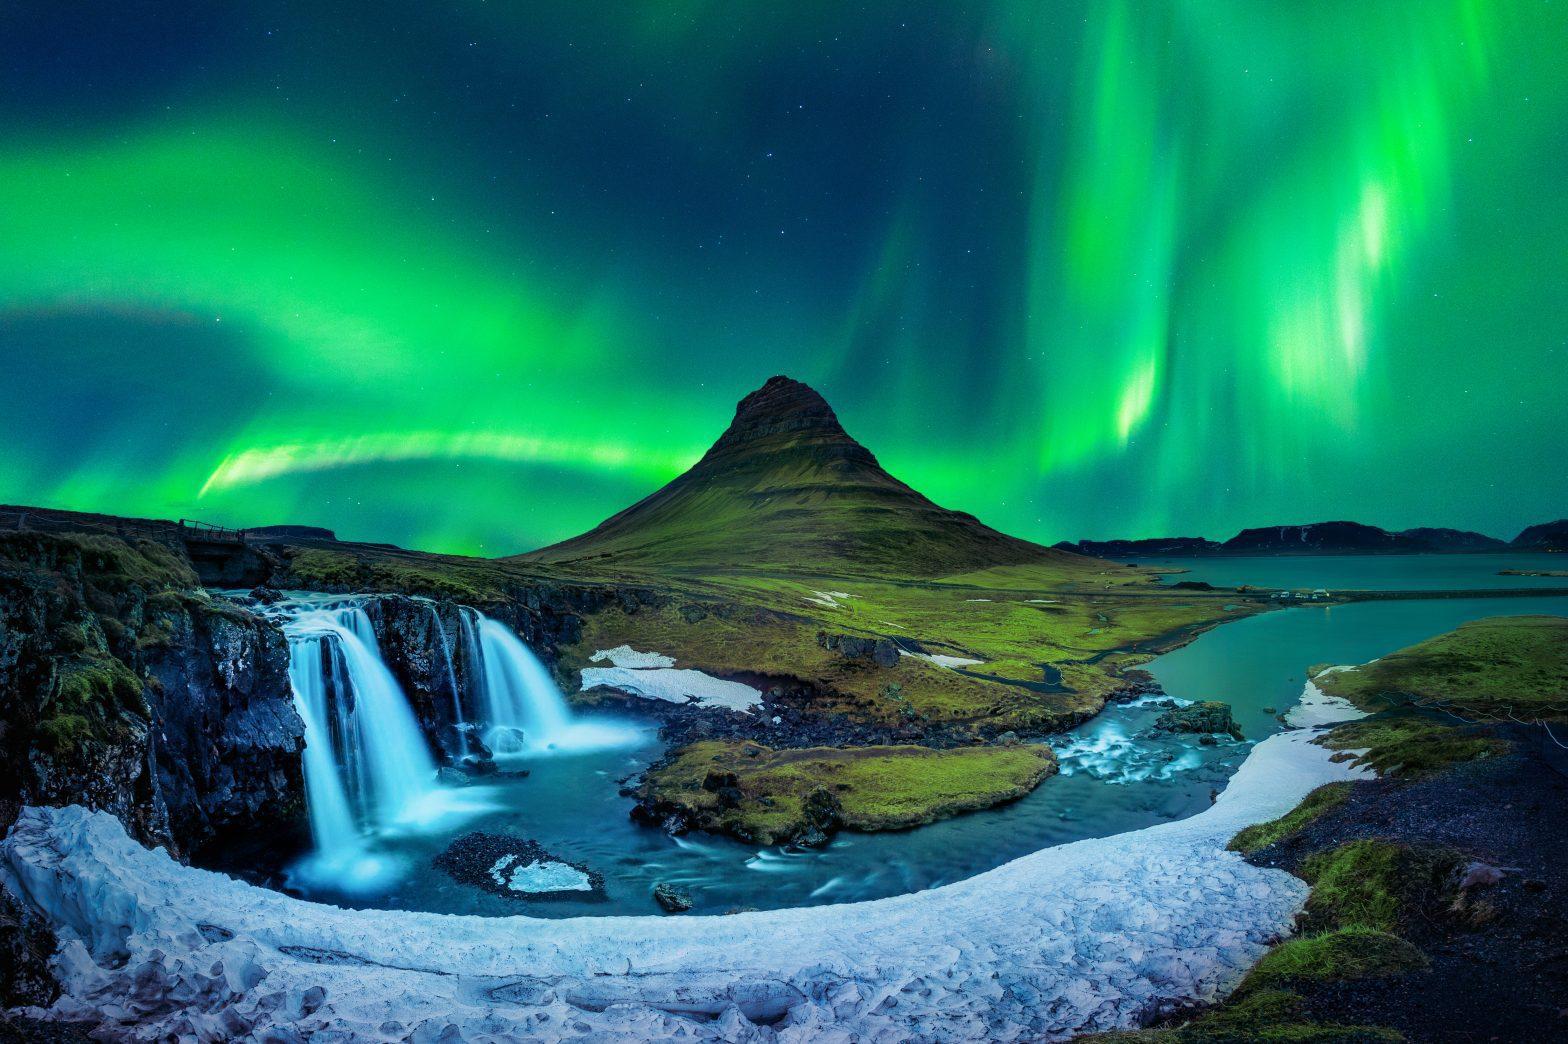 kirkjufell mountain under the northern lights in snaefellsnes peninsula